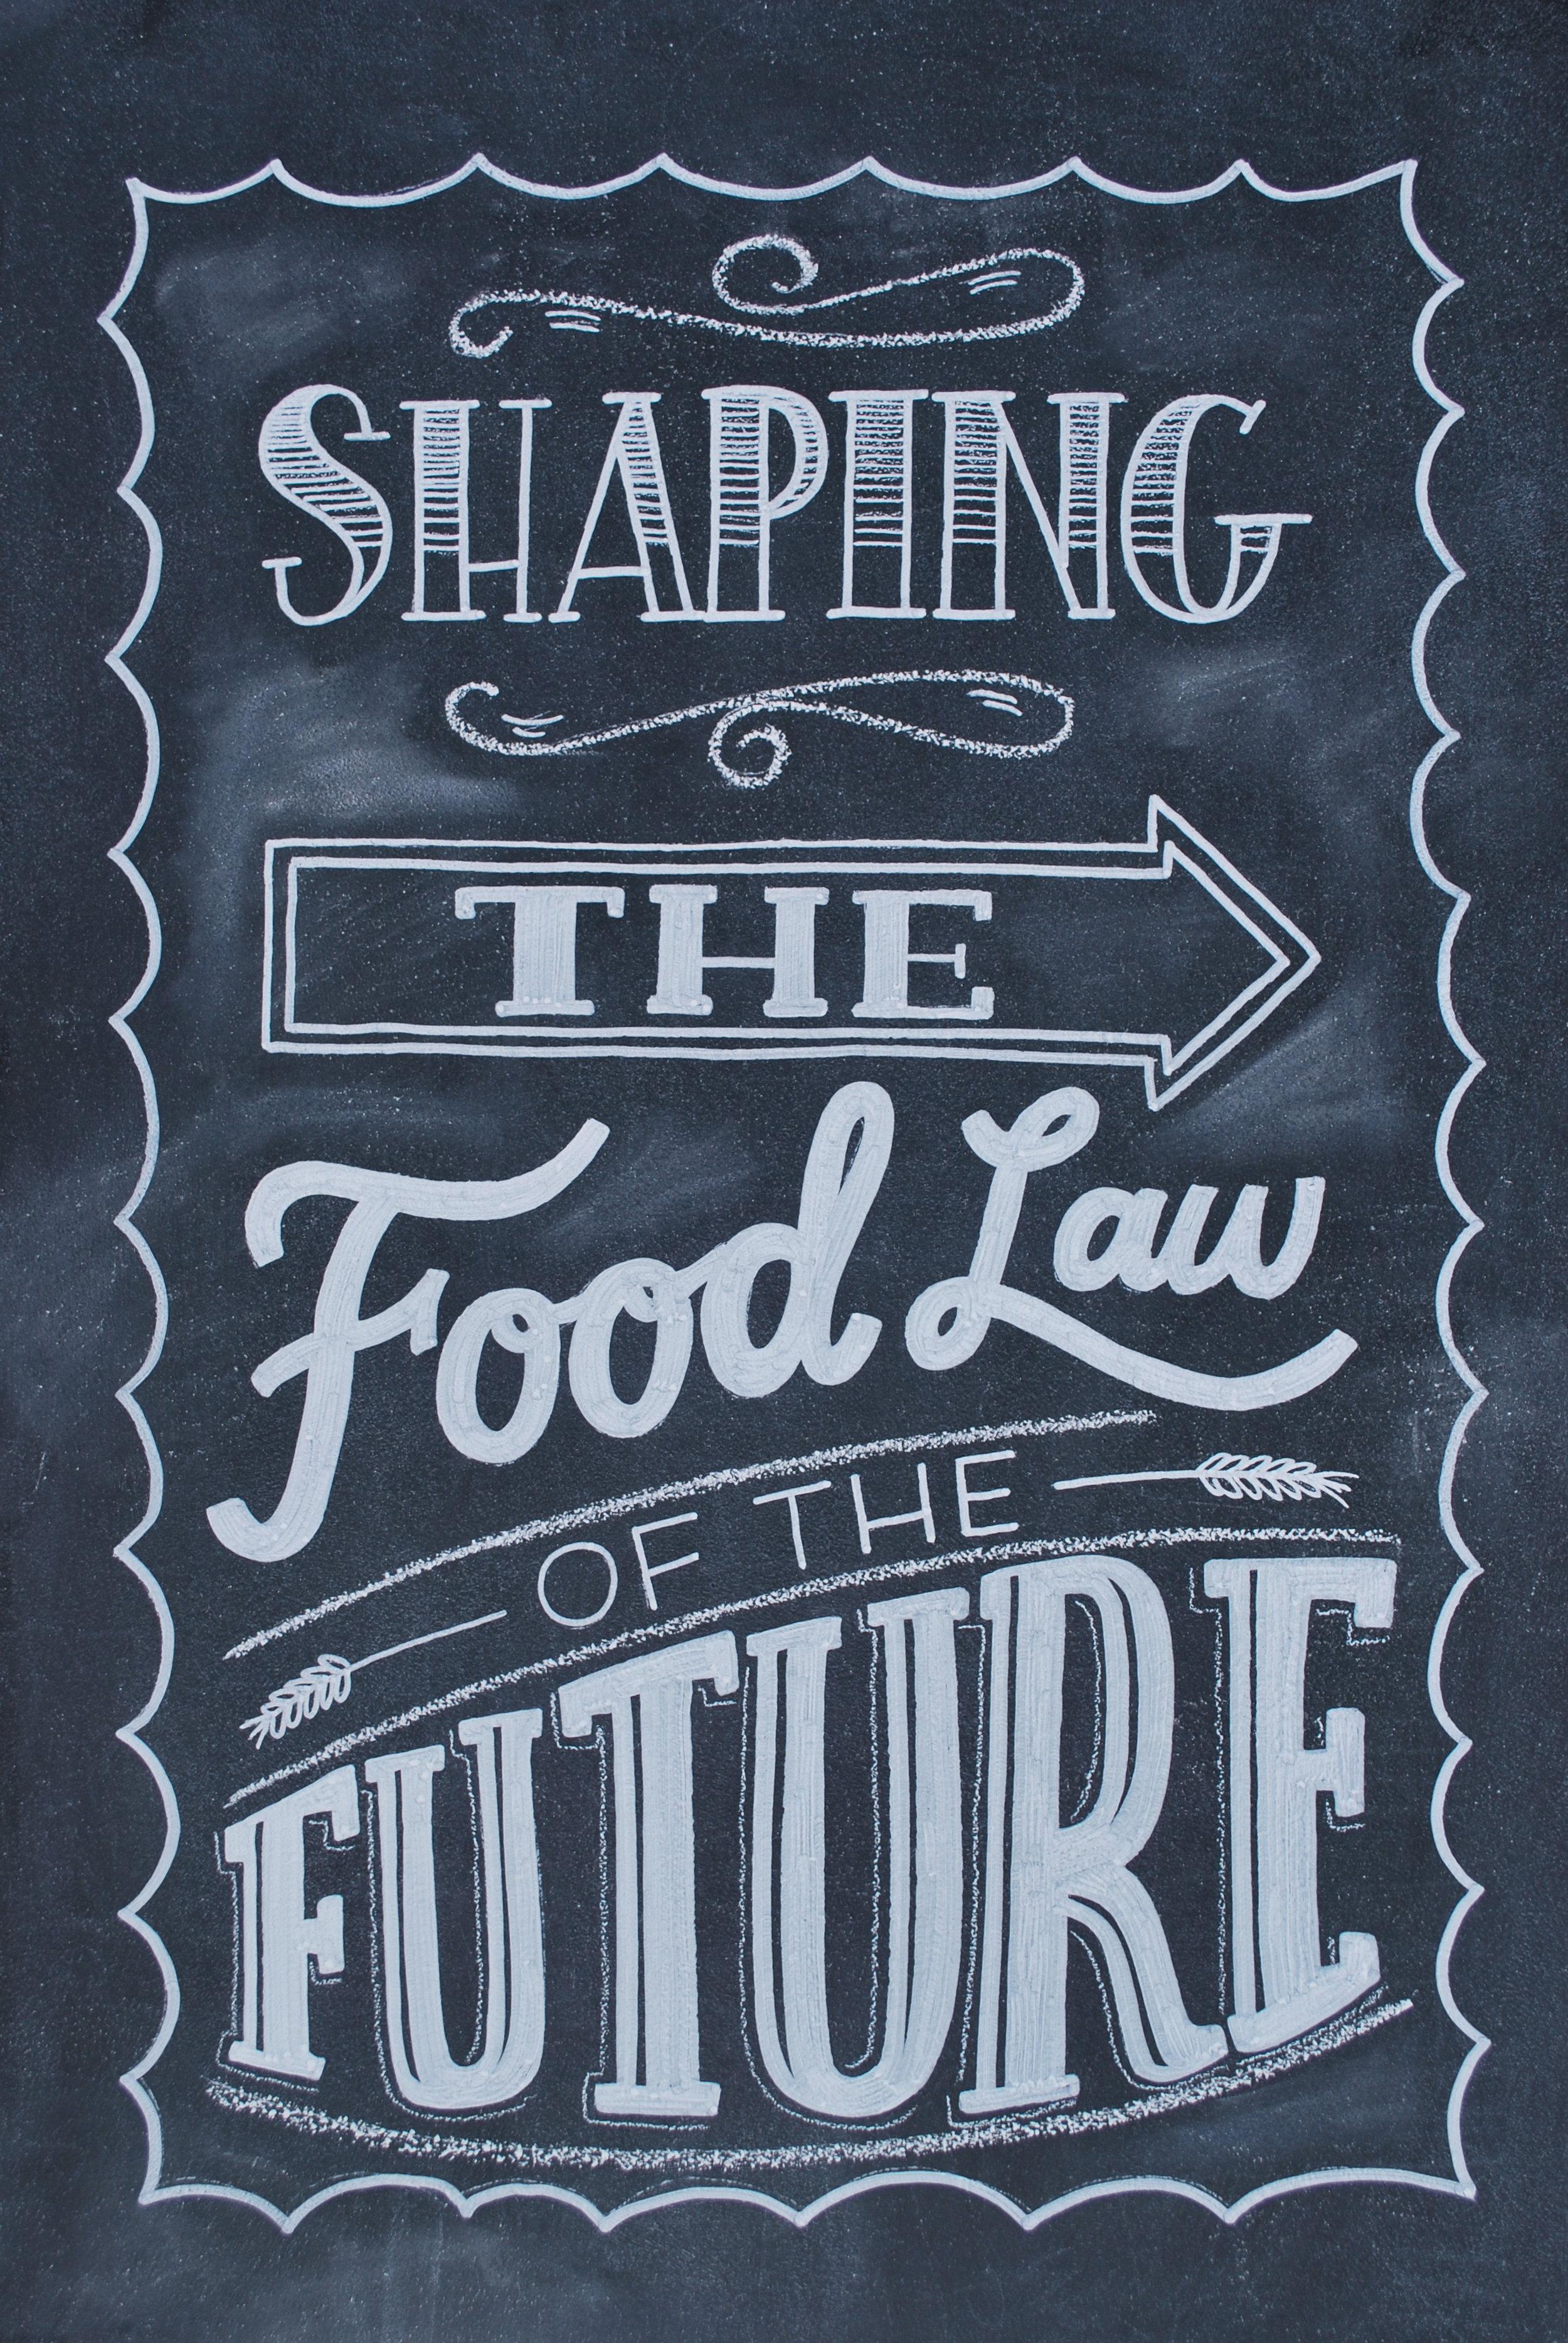 Chalkboard/Hand Lettering Design for Magazine